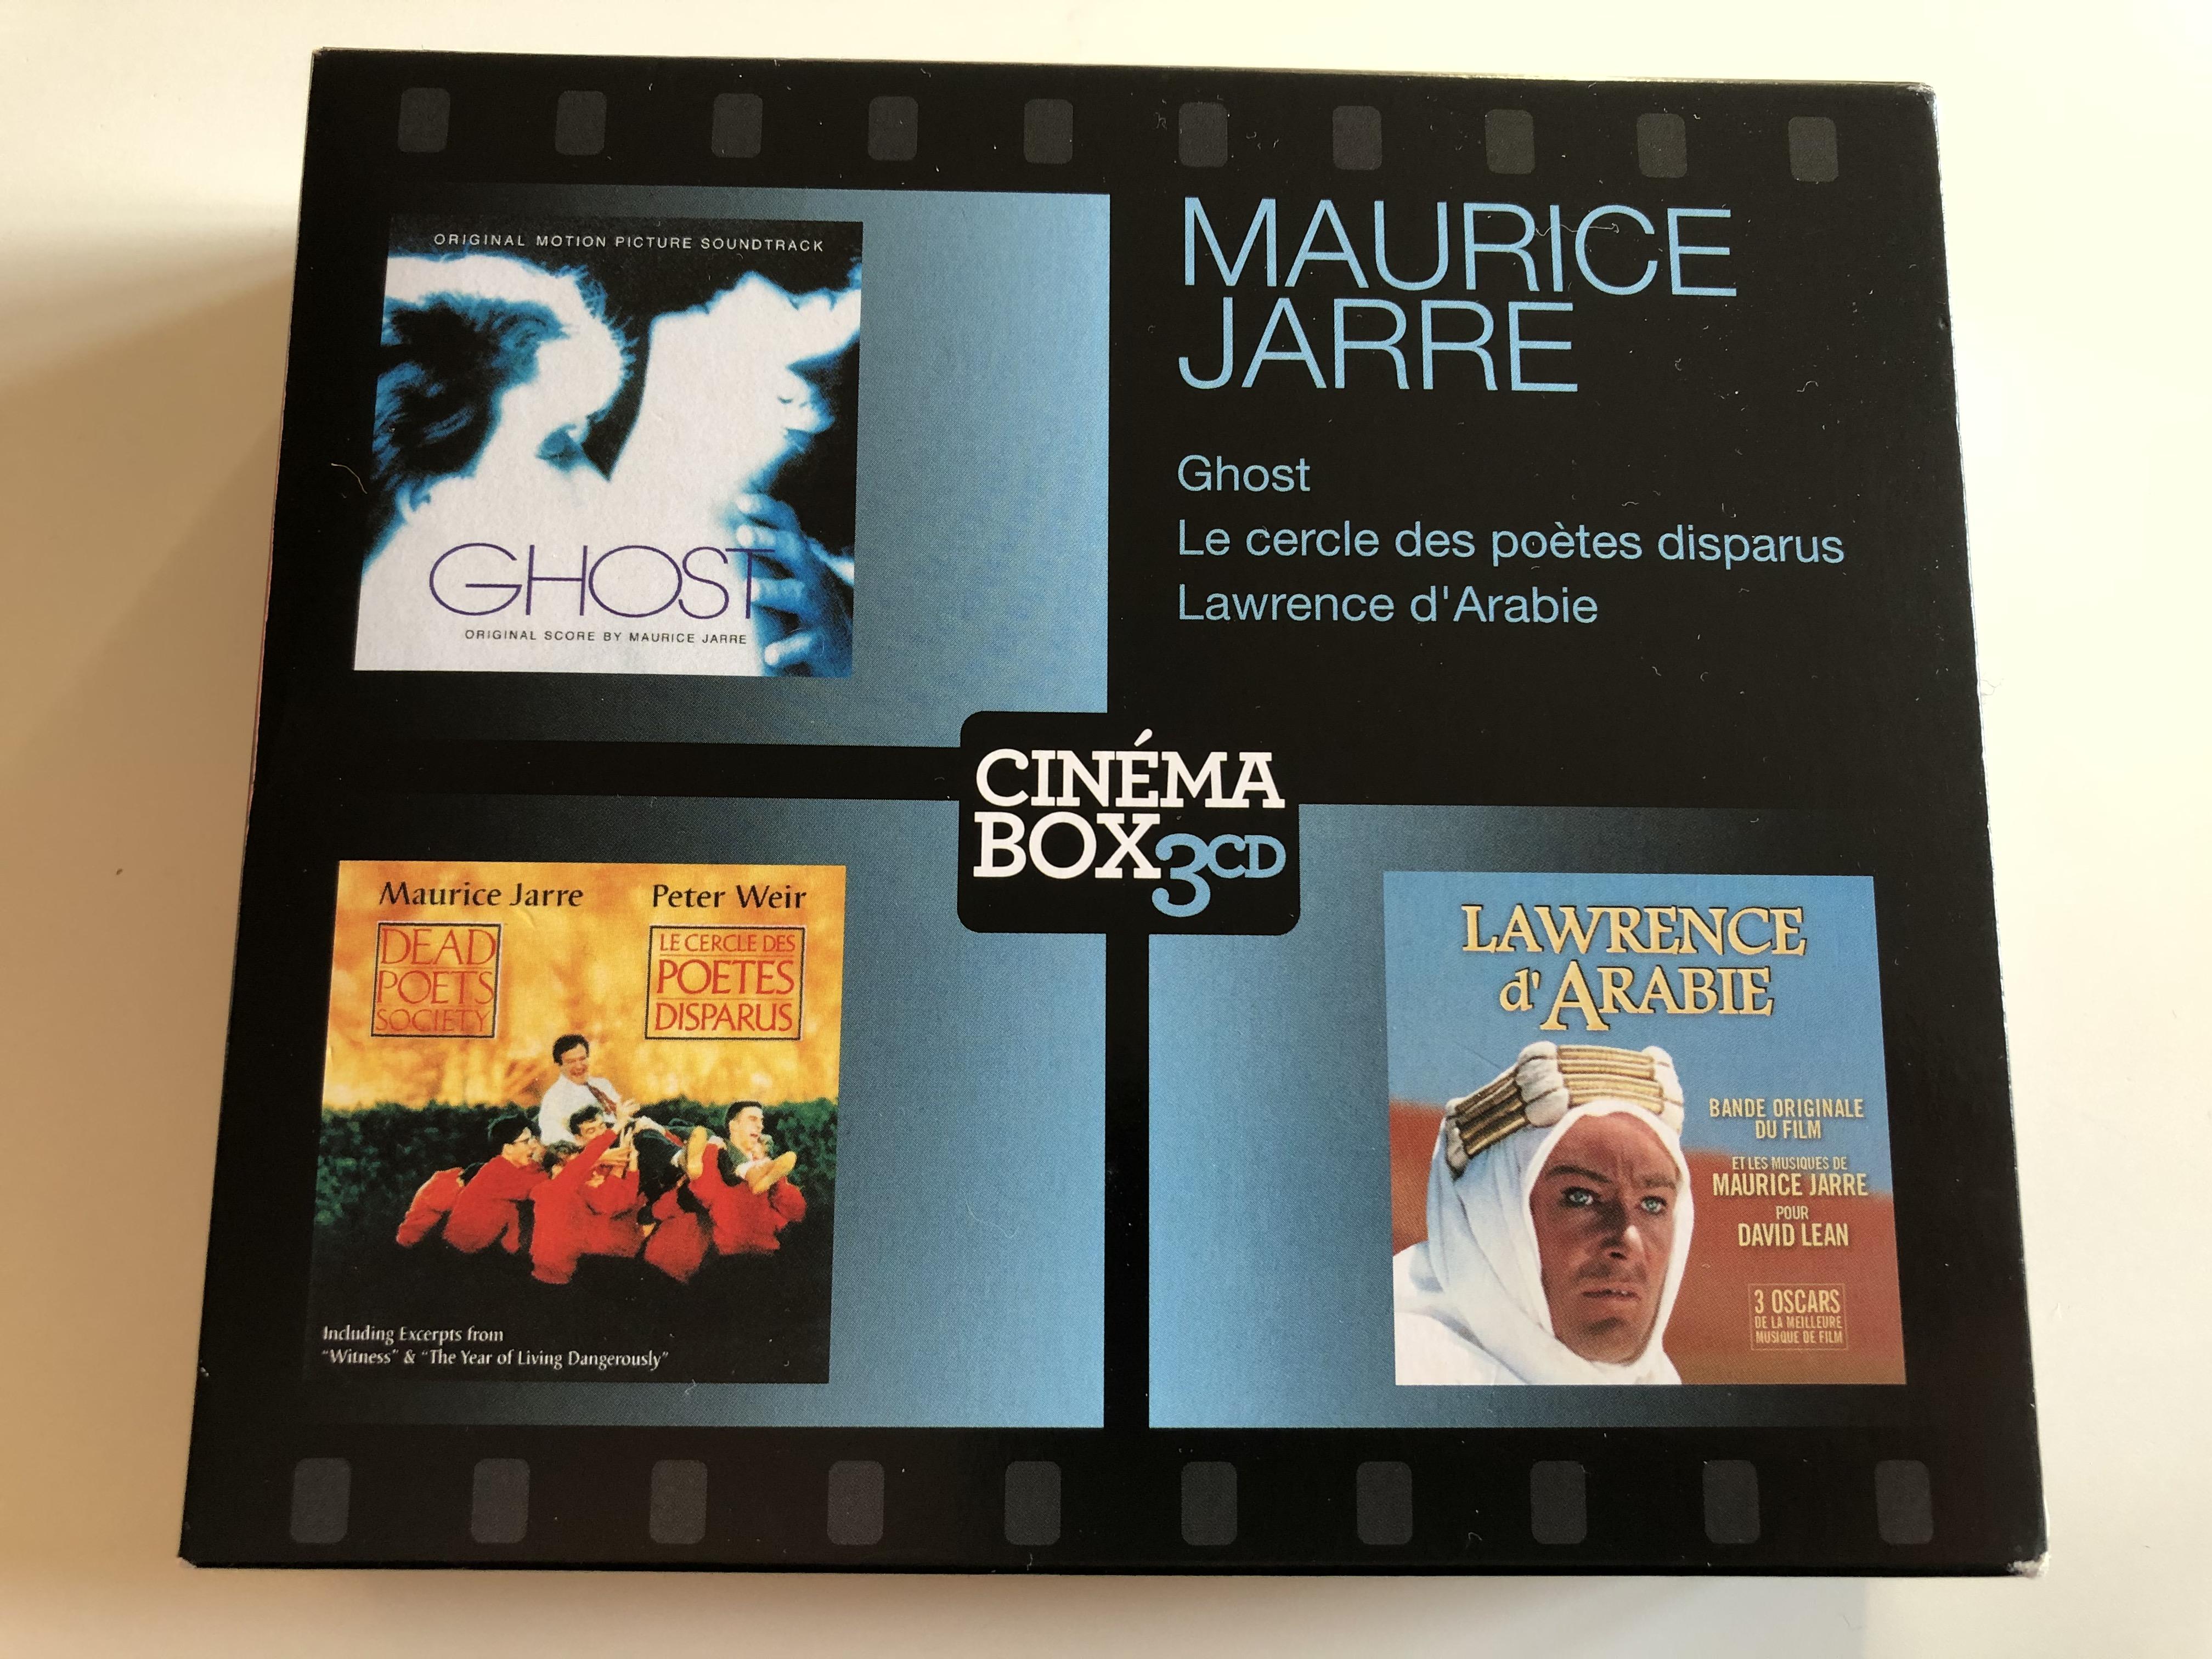 maurice-jarre-ghost-le-cercle-des-poetes-disparus-lawrence-d-arabie-cinema-box-3x-milan-audio-cd-2013-3995102-1-.jpg